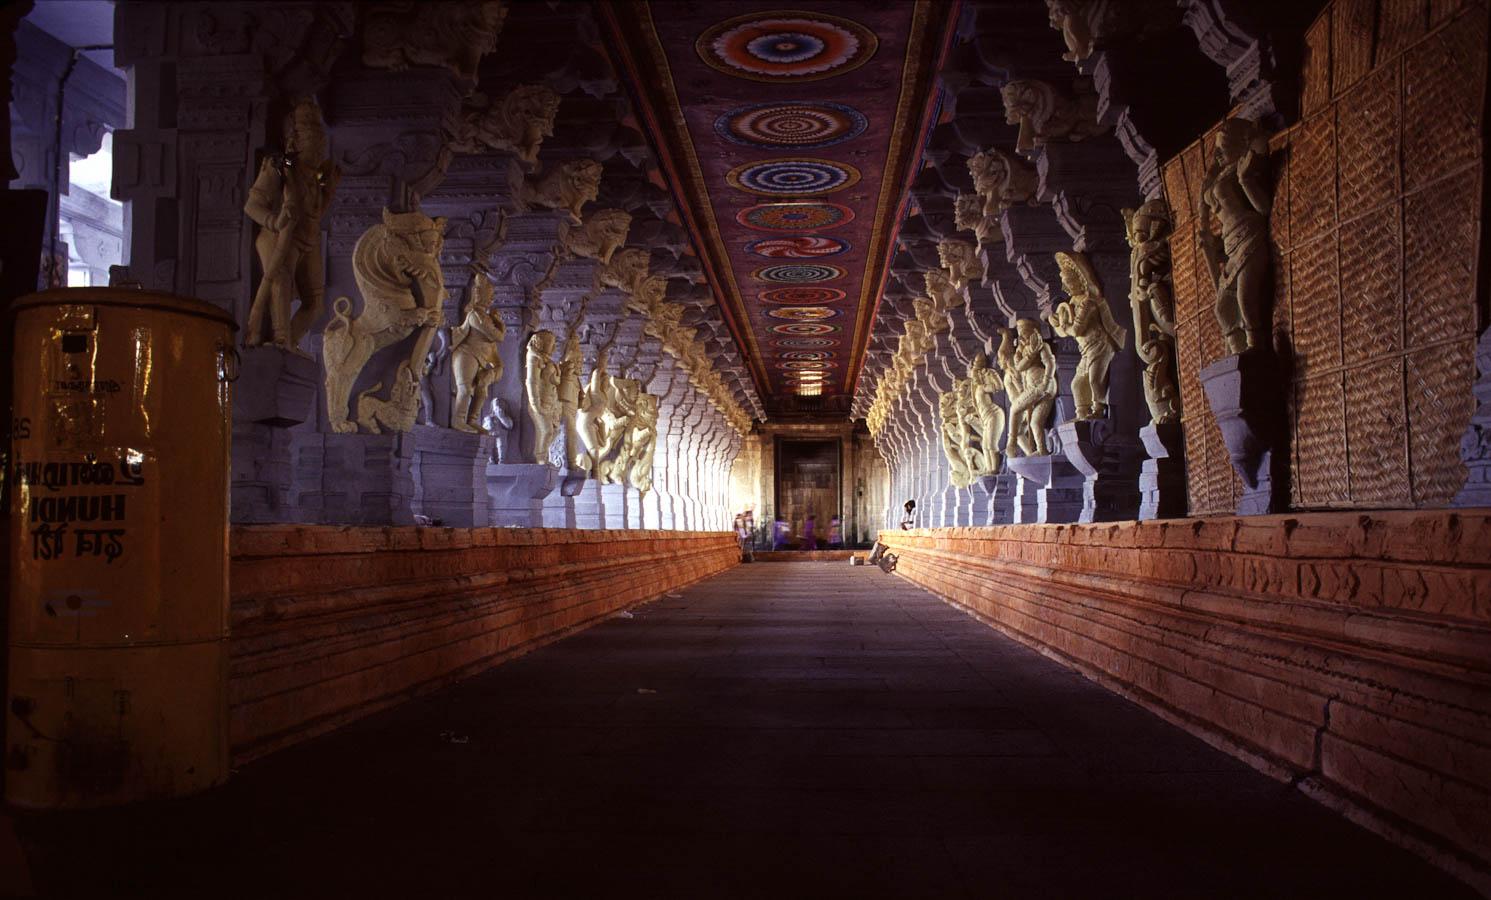 travel-photography-india-9-jpg